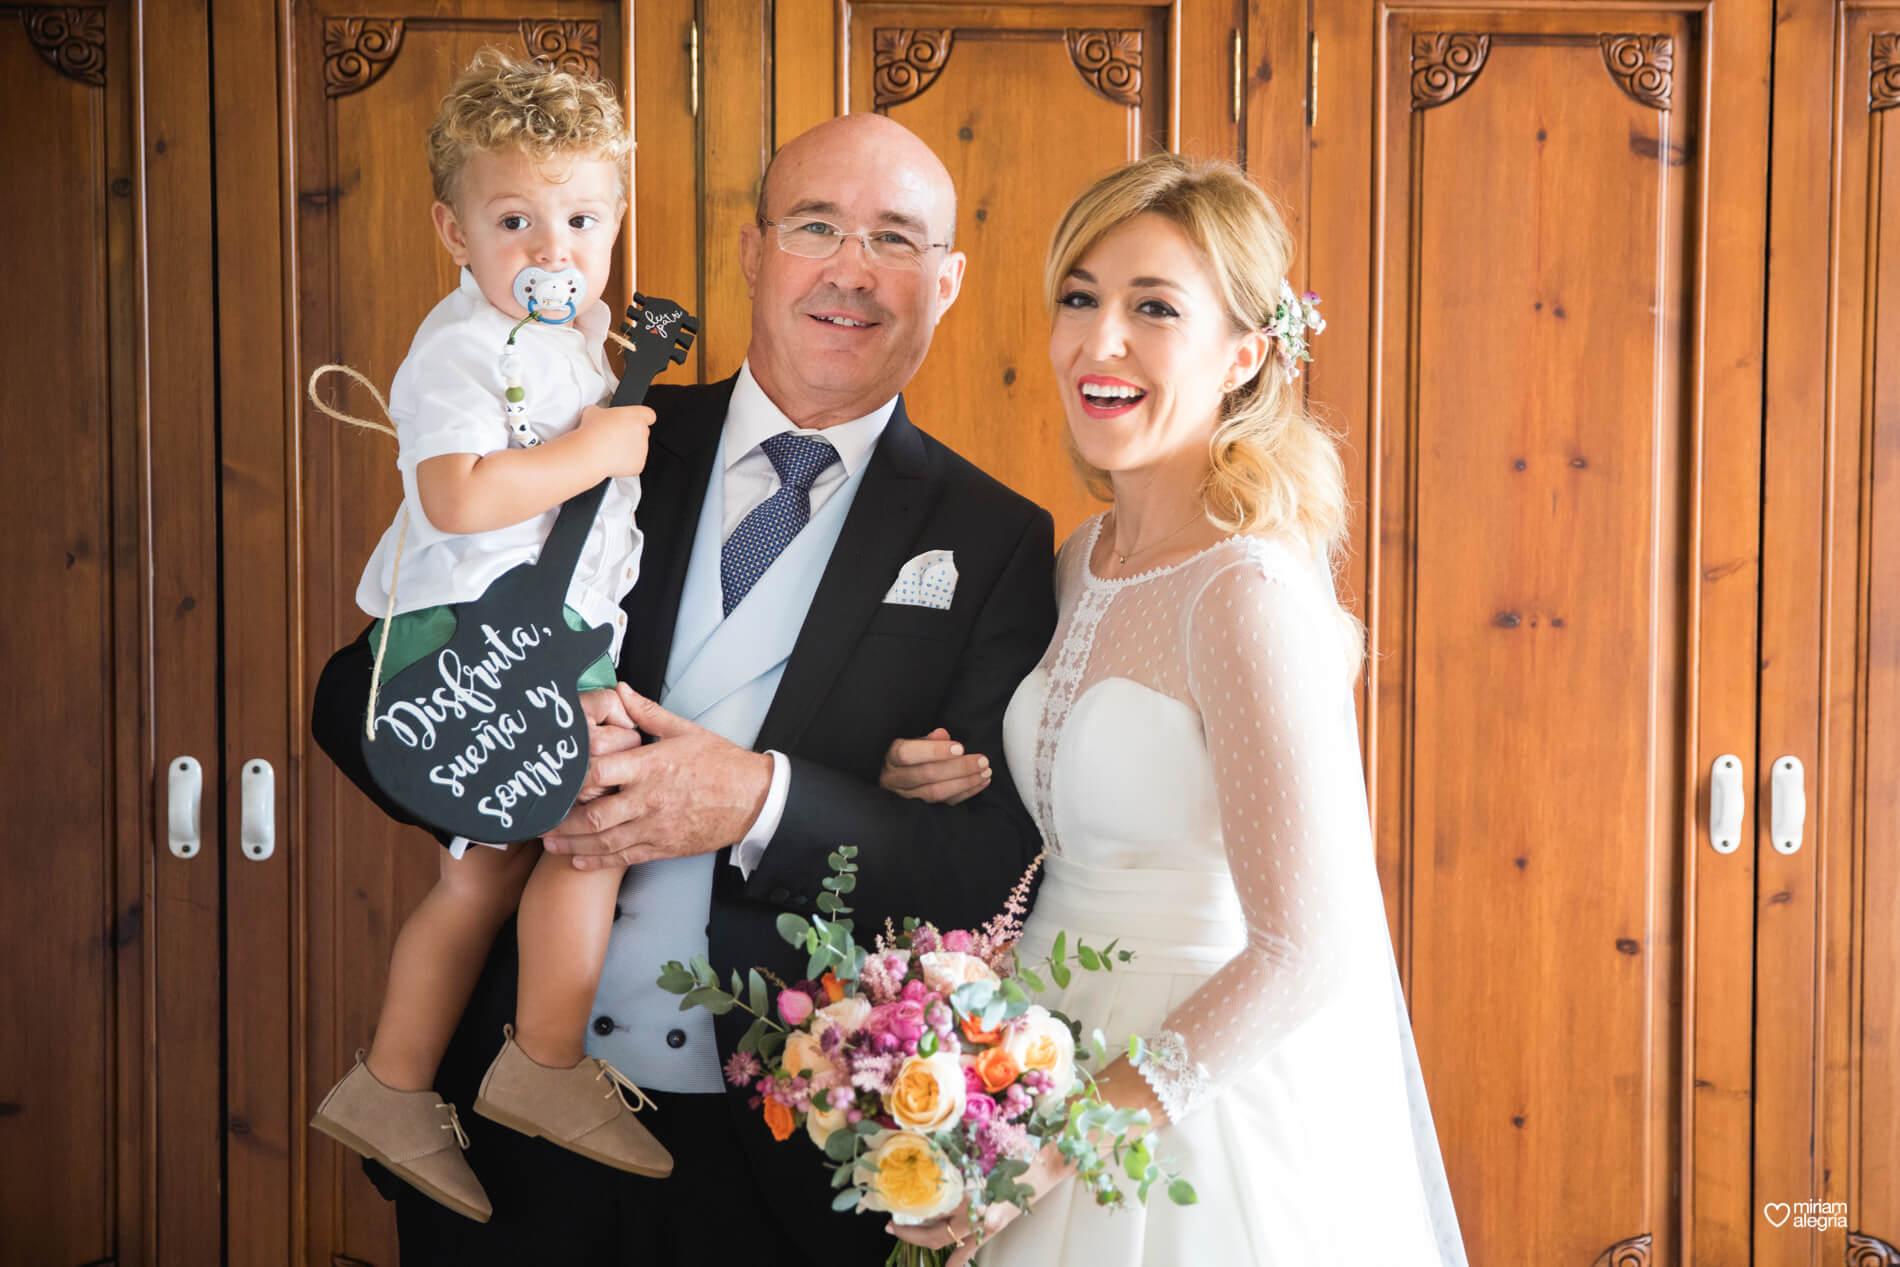 la-boda-de-alemc7-miriam-alegria-fotografos-boda-murcia-36